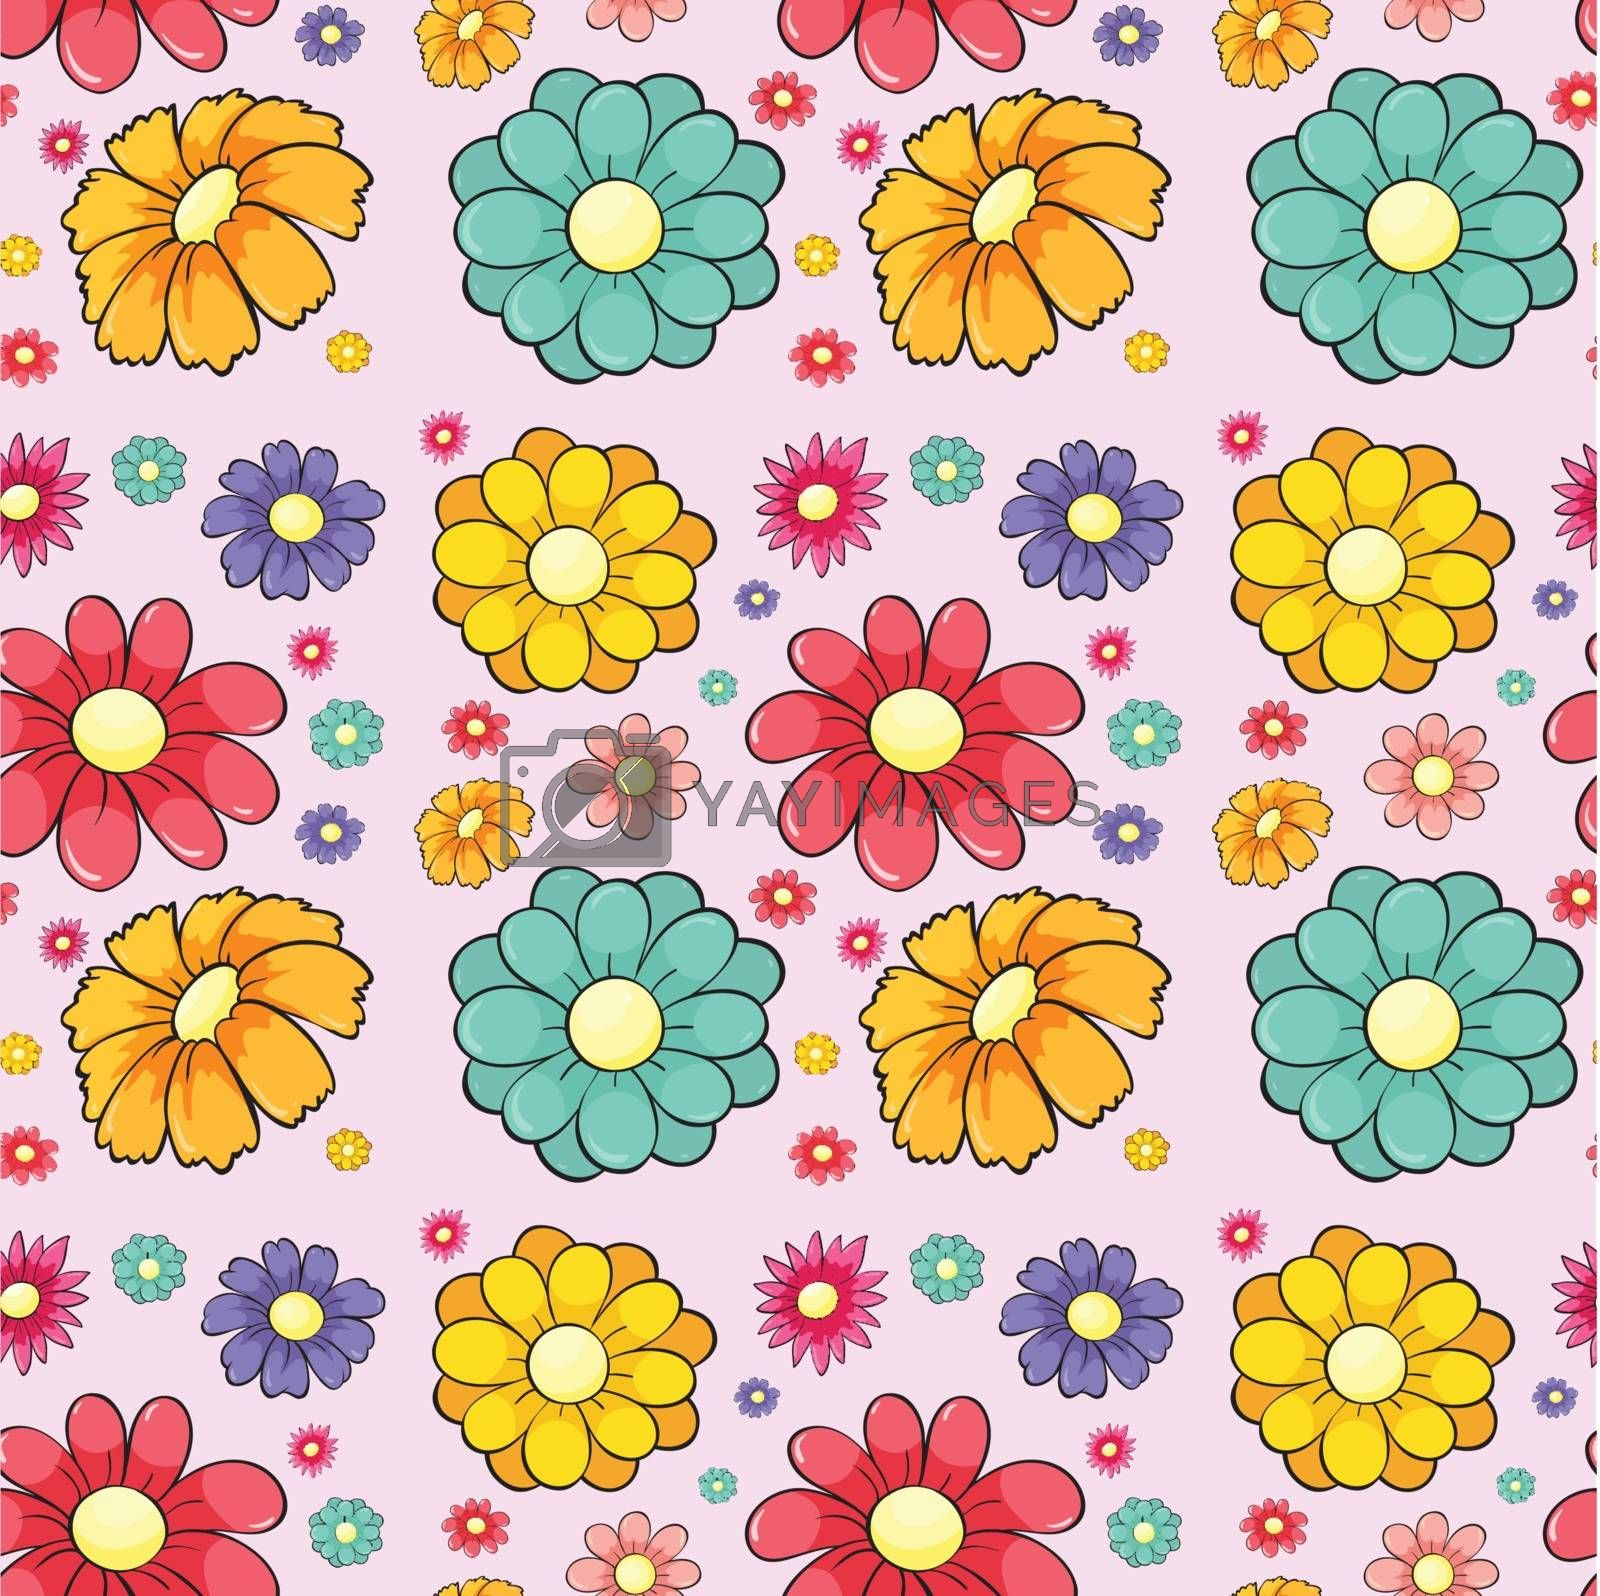 Flowers seamless by iimages